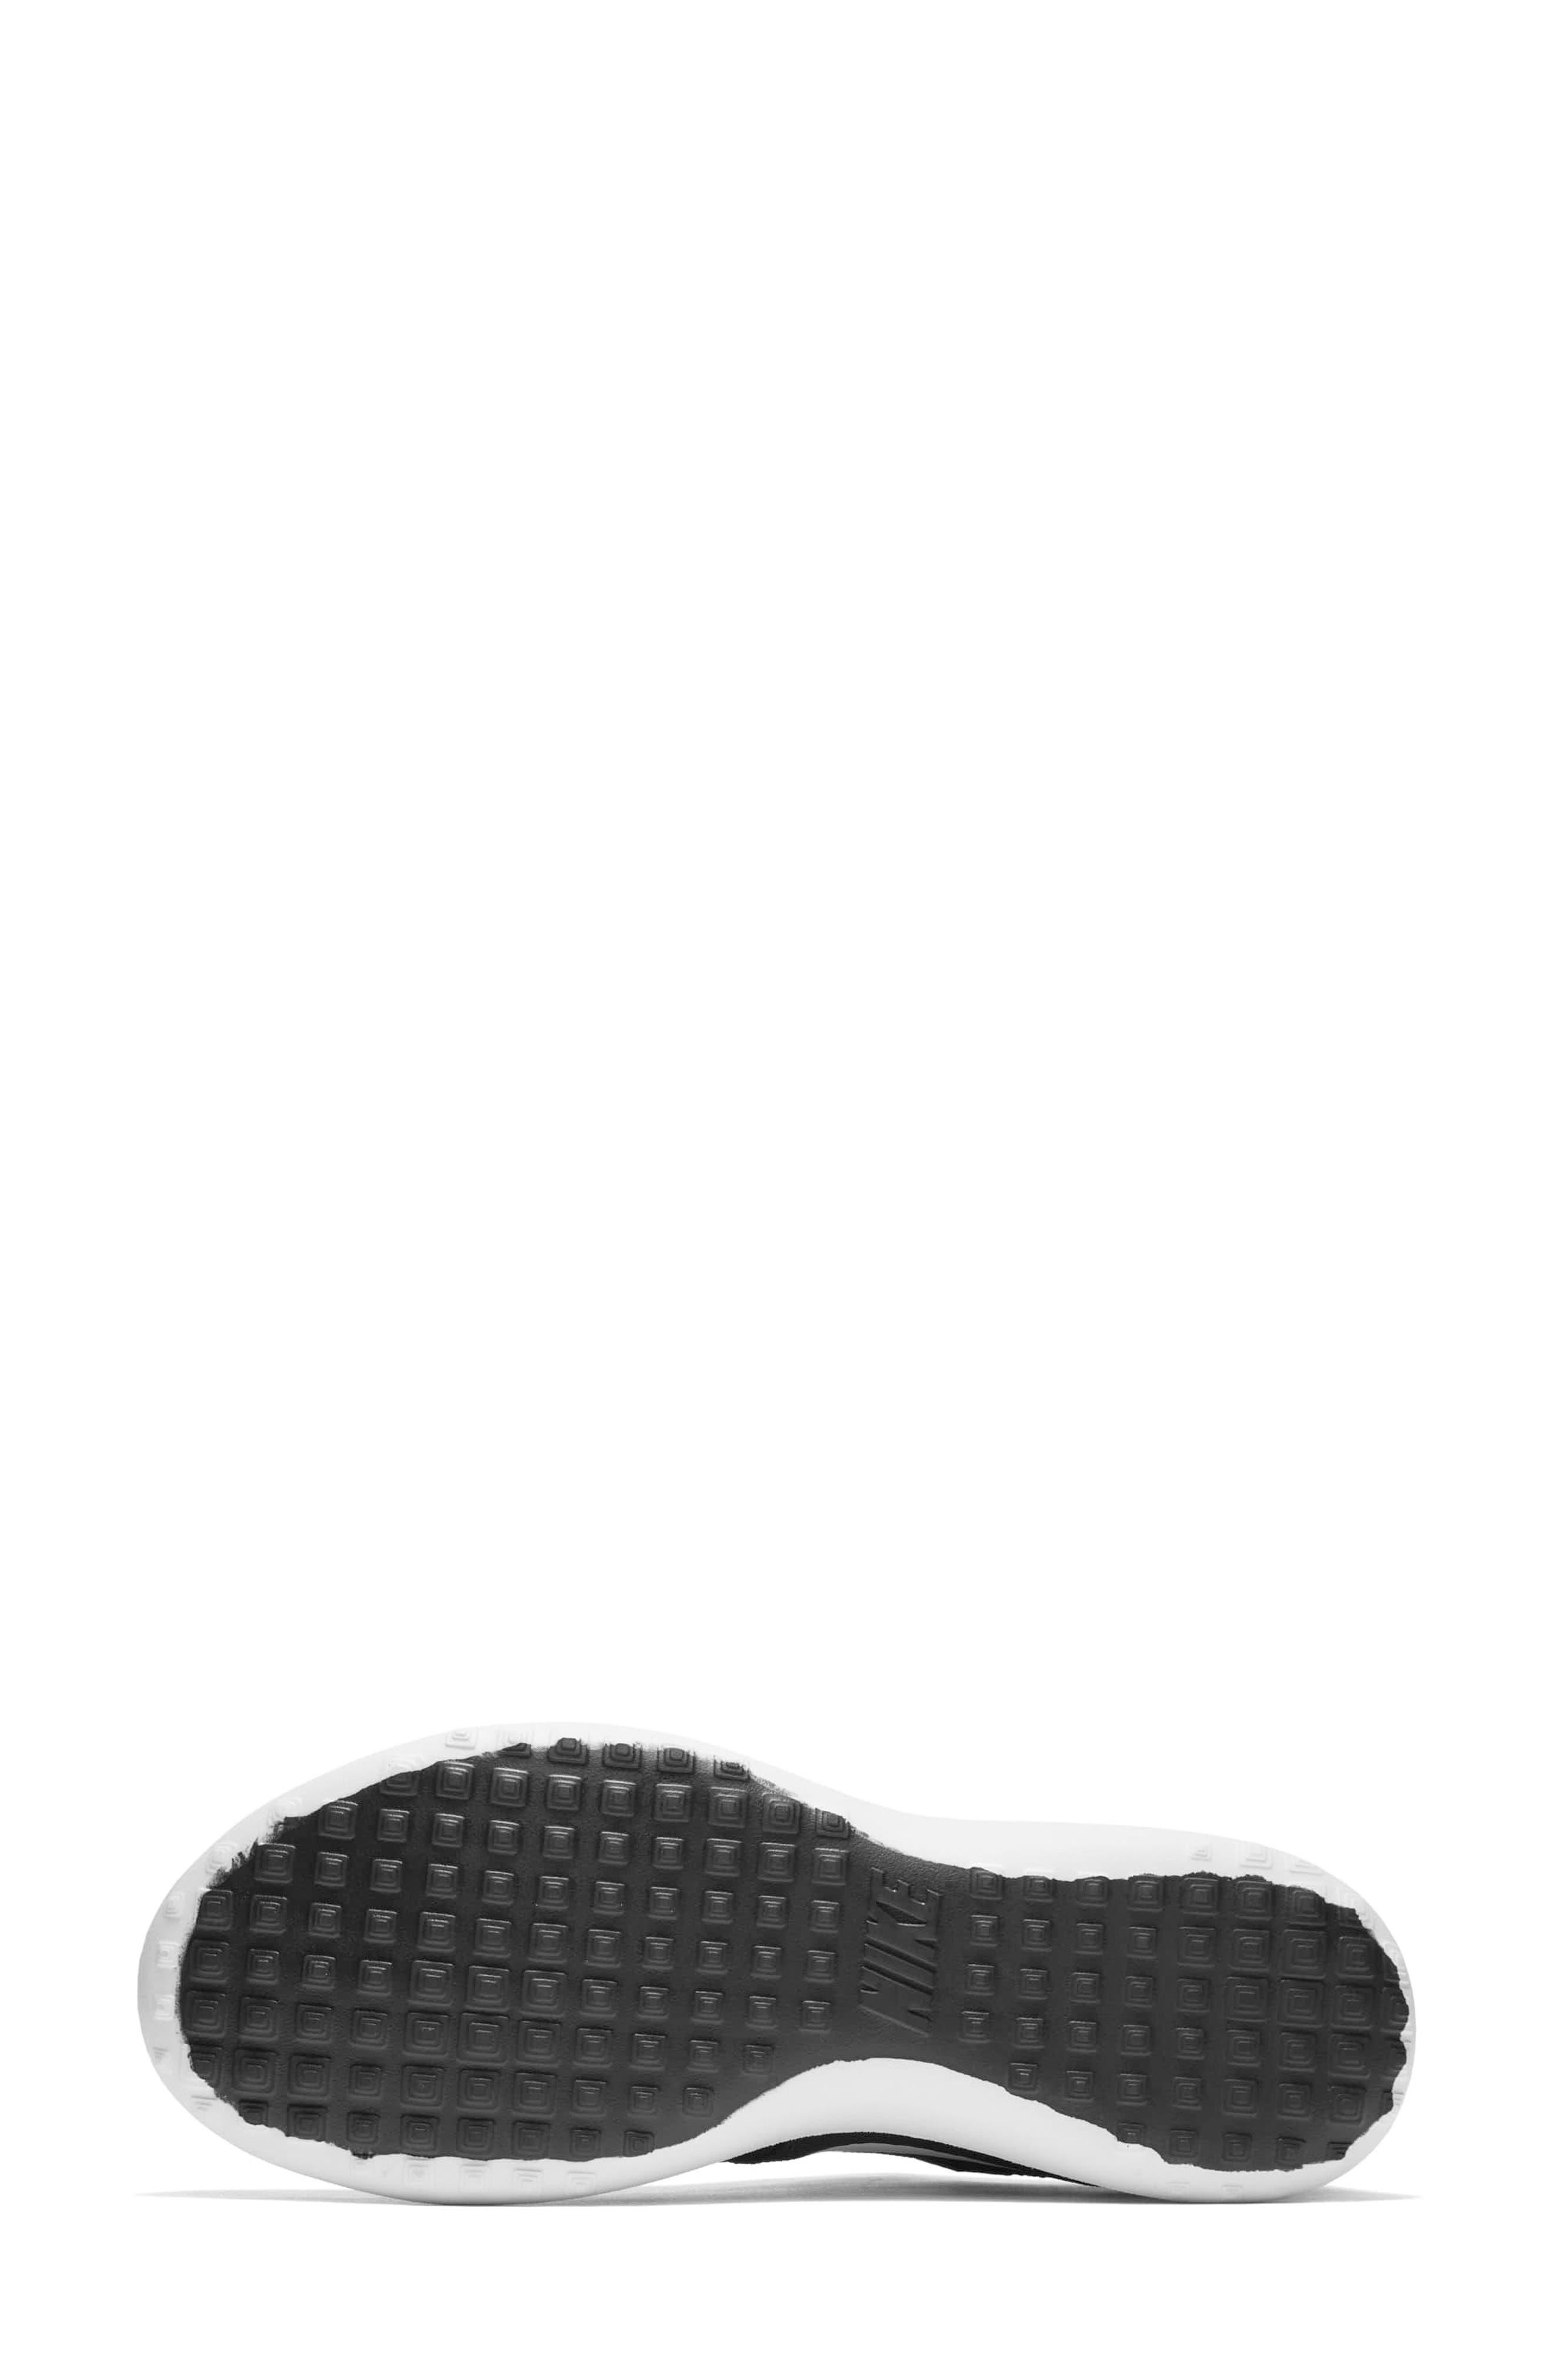 Juvenate Sneaker,                             Alternate thumbnail 248, color,